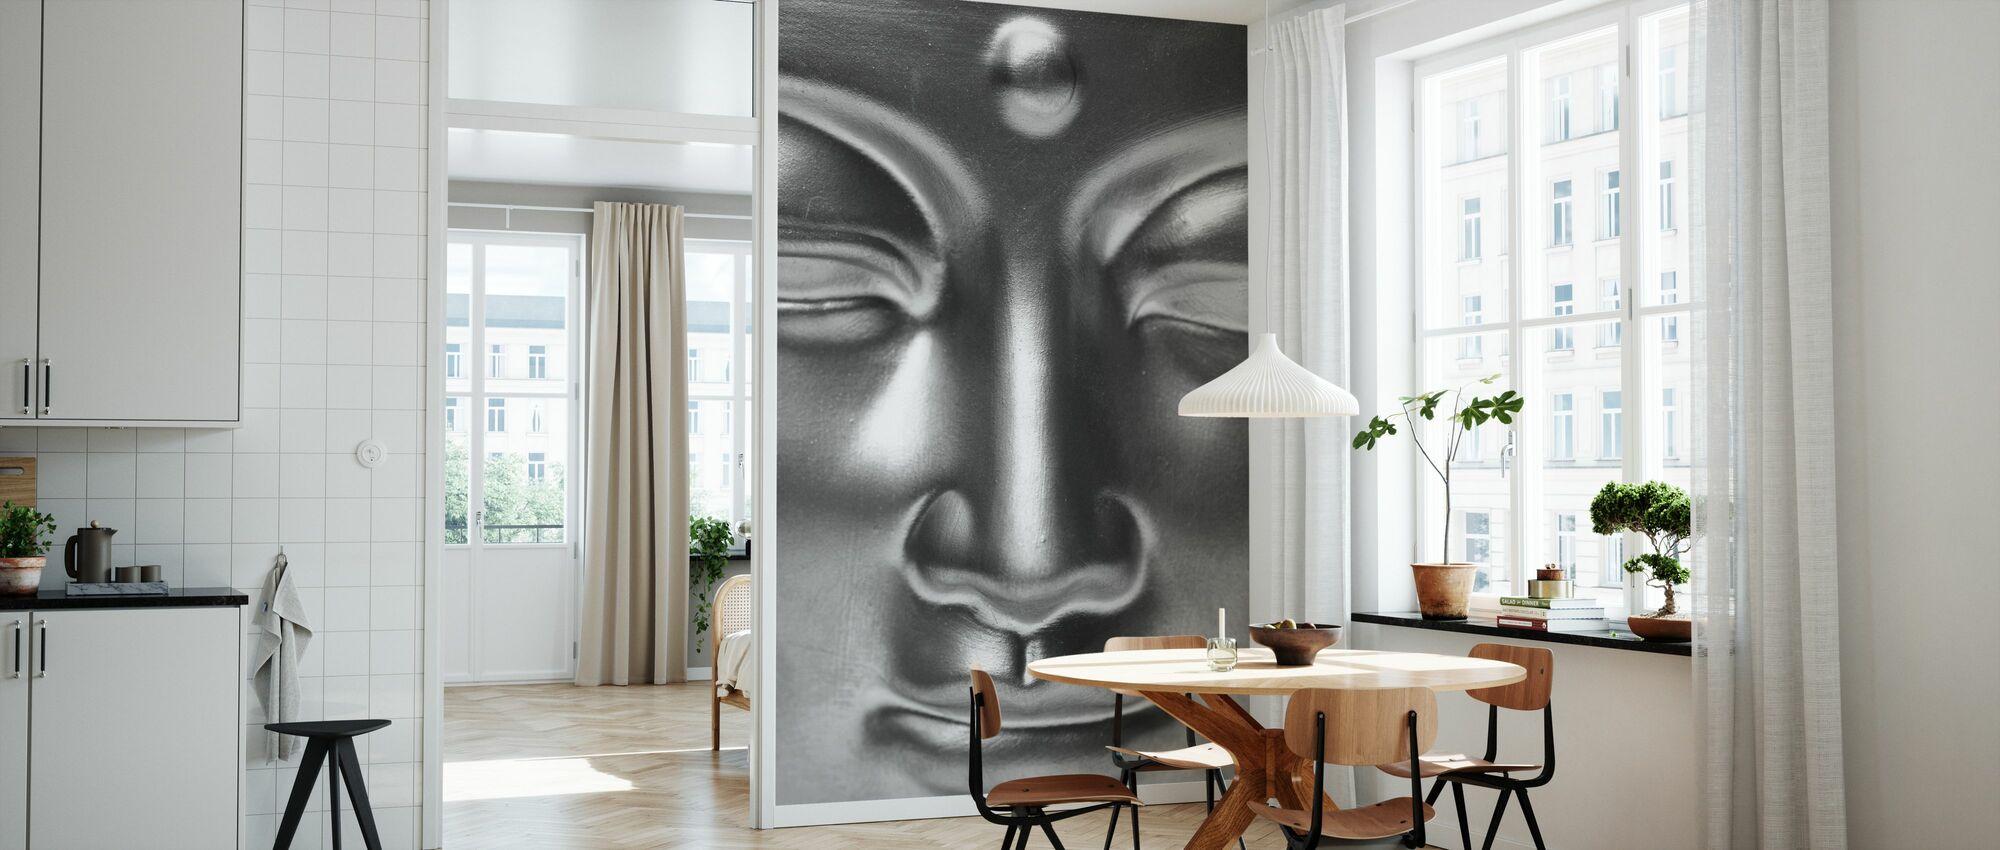 Golden Buddha närbild - b/w - Tapet - Kök